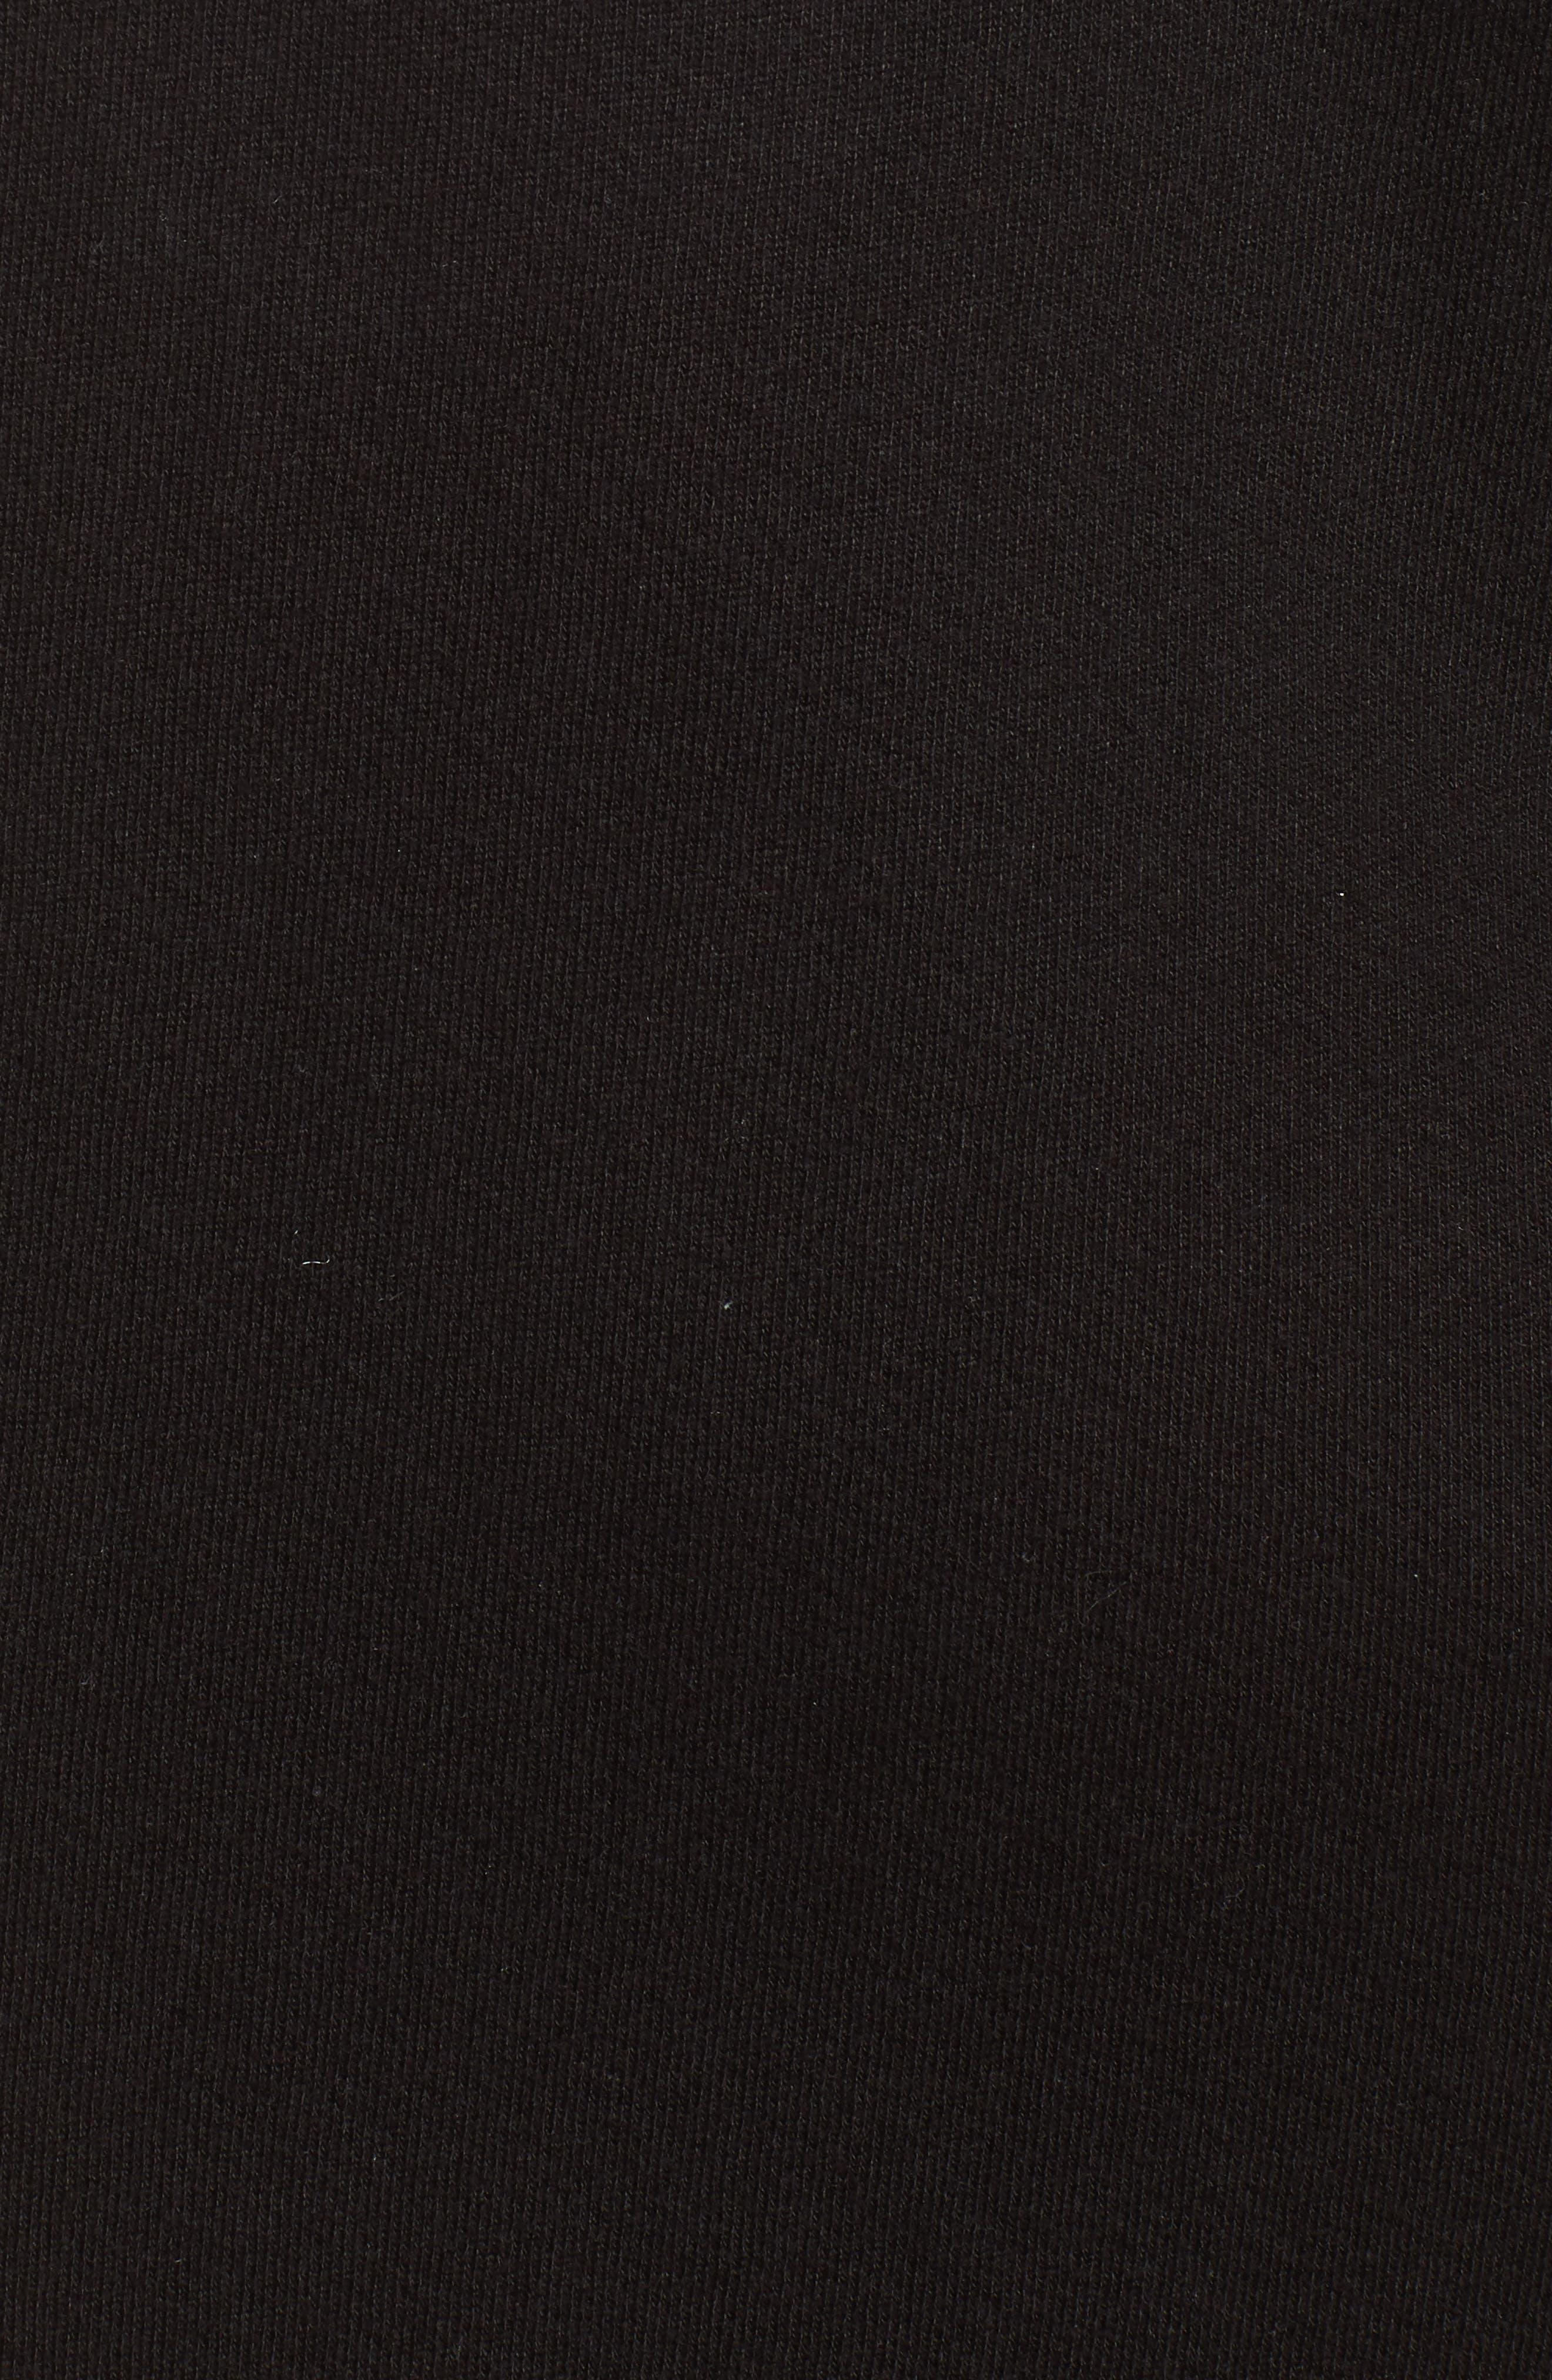 Camino One-Shoulder Dress,                             Alternate thumbnail 5, color,                             Black Cat